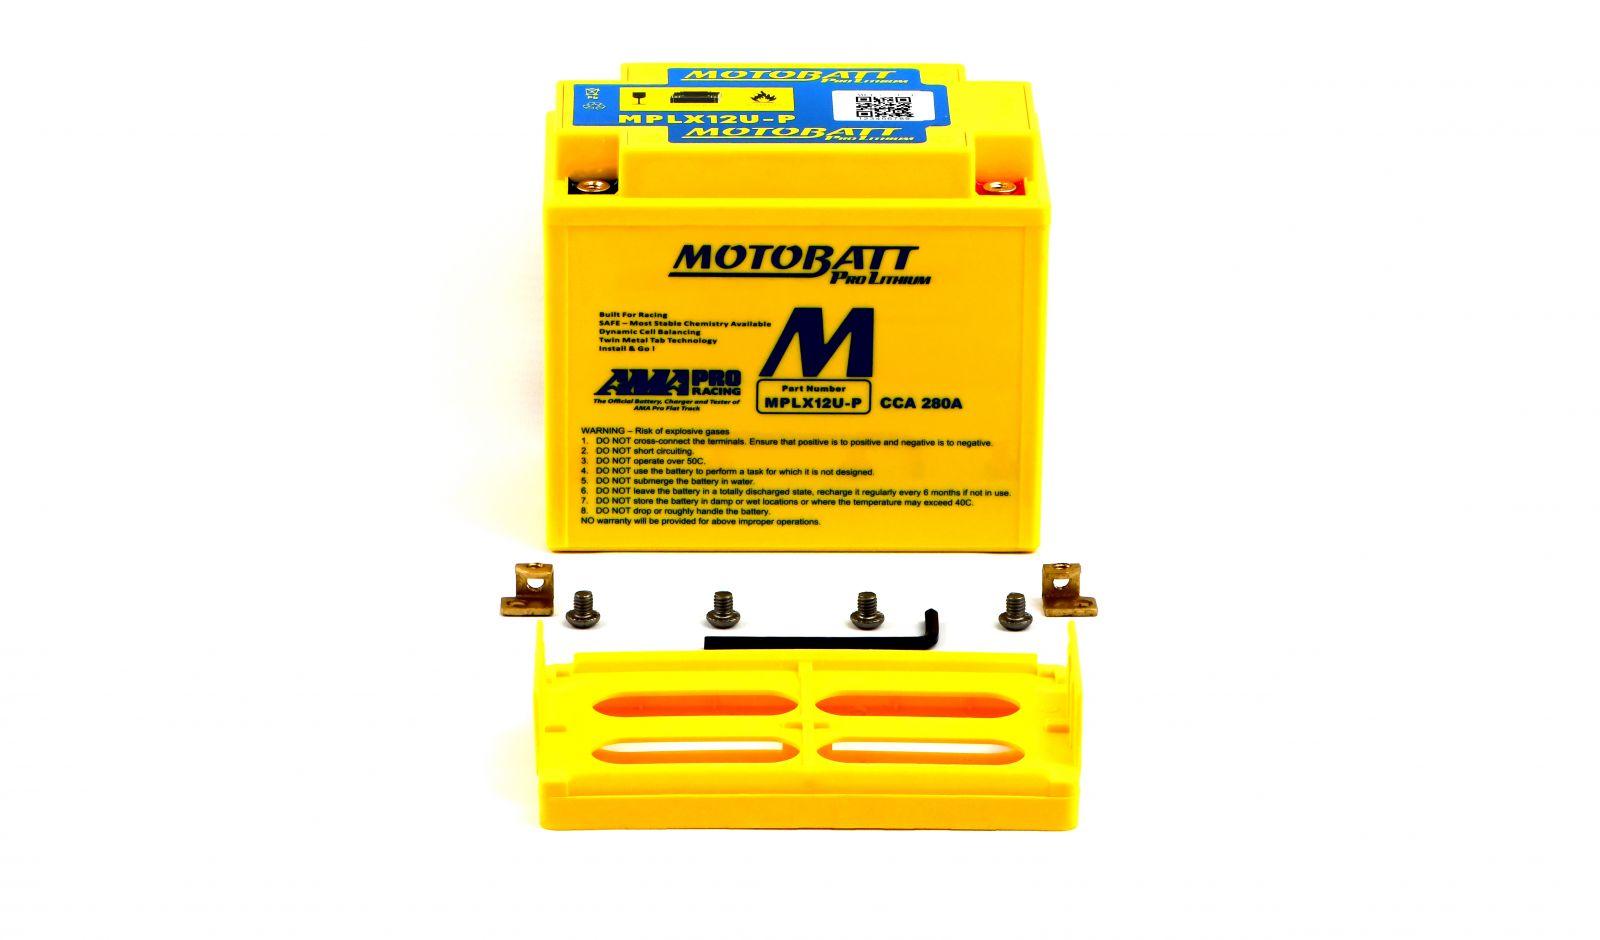 Motobatt Lithium Batteries - 501125ML image